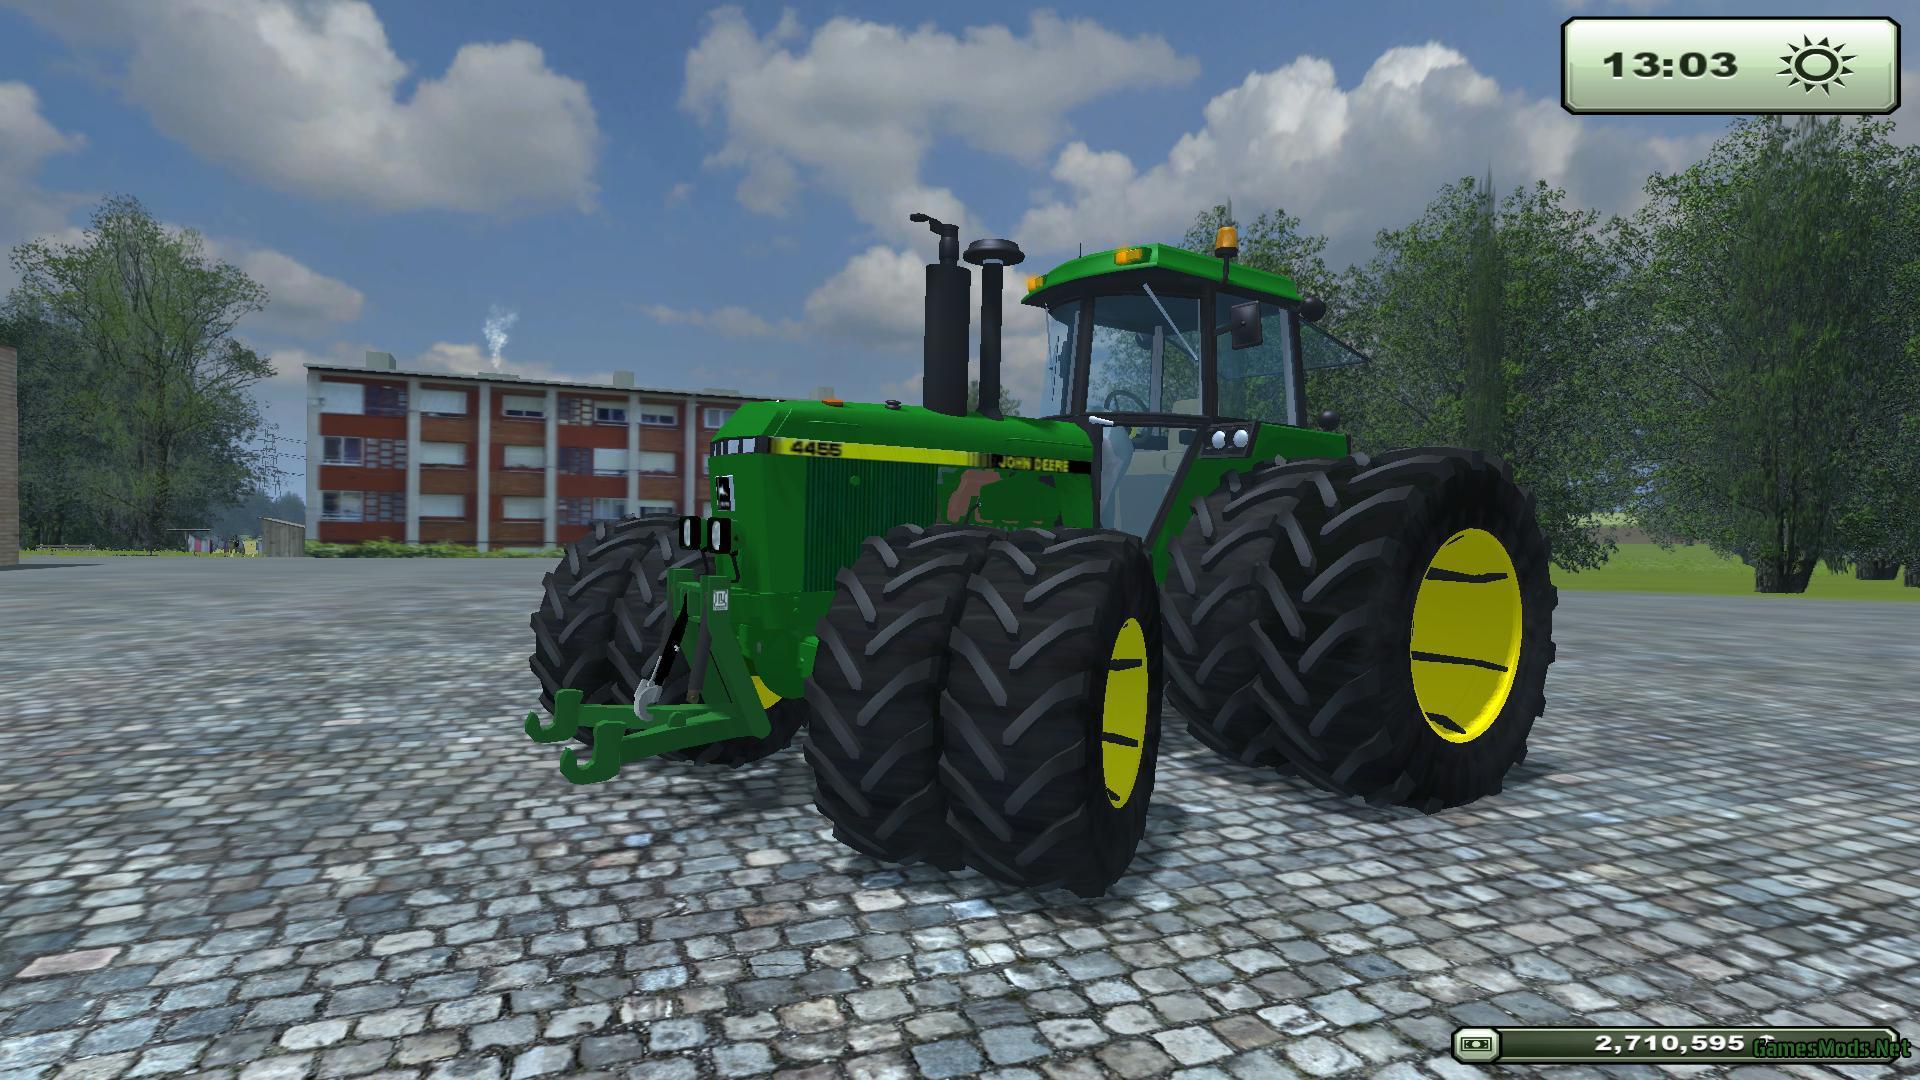 Farming Simulator 2013 John Deere Tractors